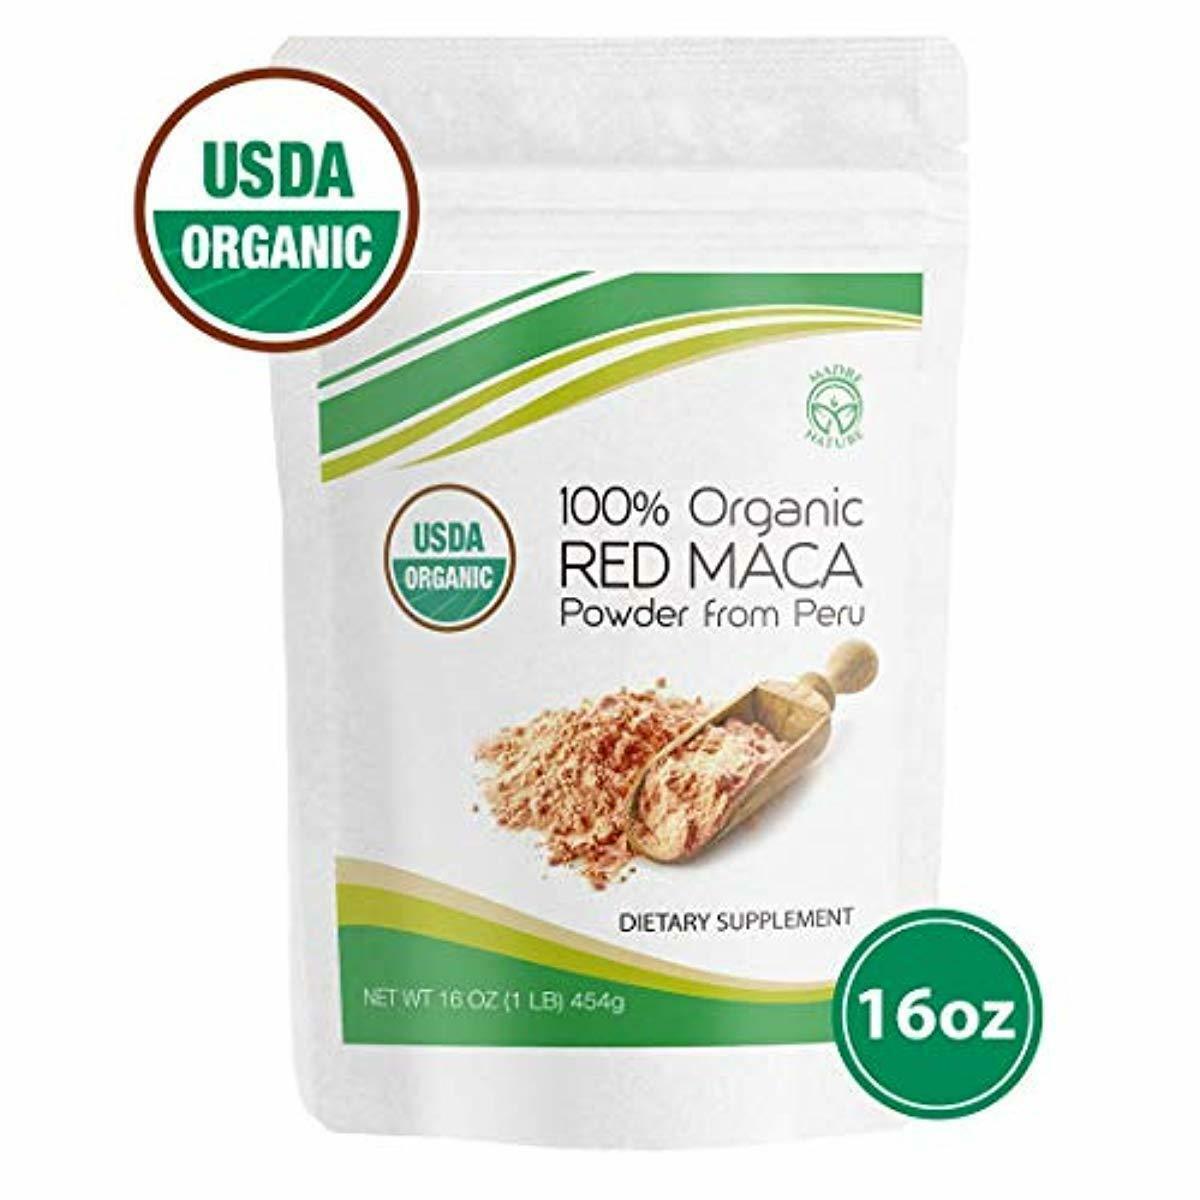 Madre Nature - 100% Peruvian Organic Gelatinized Red Maca Po